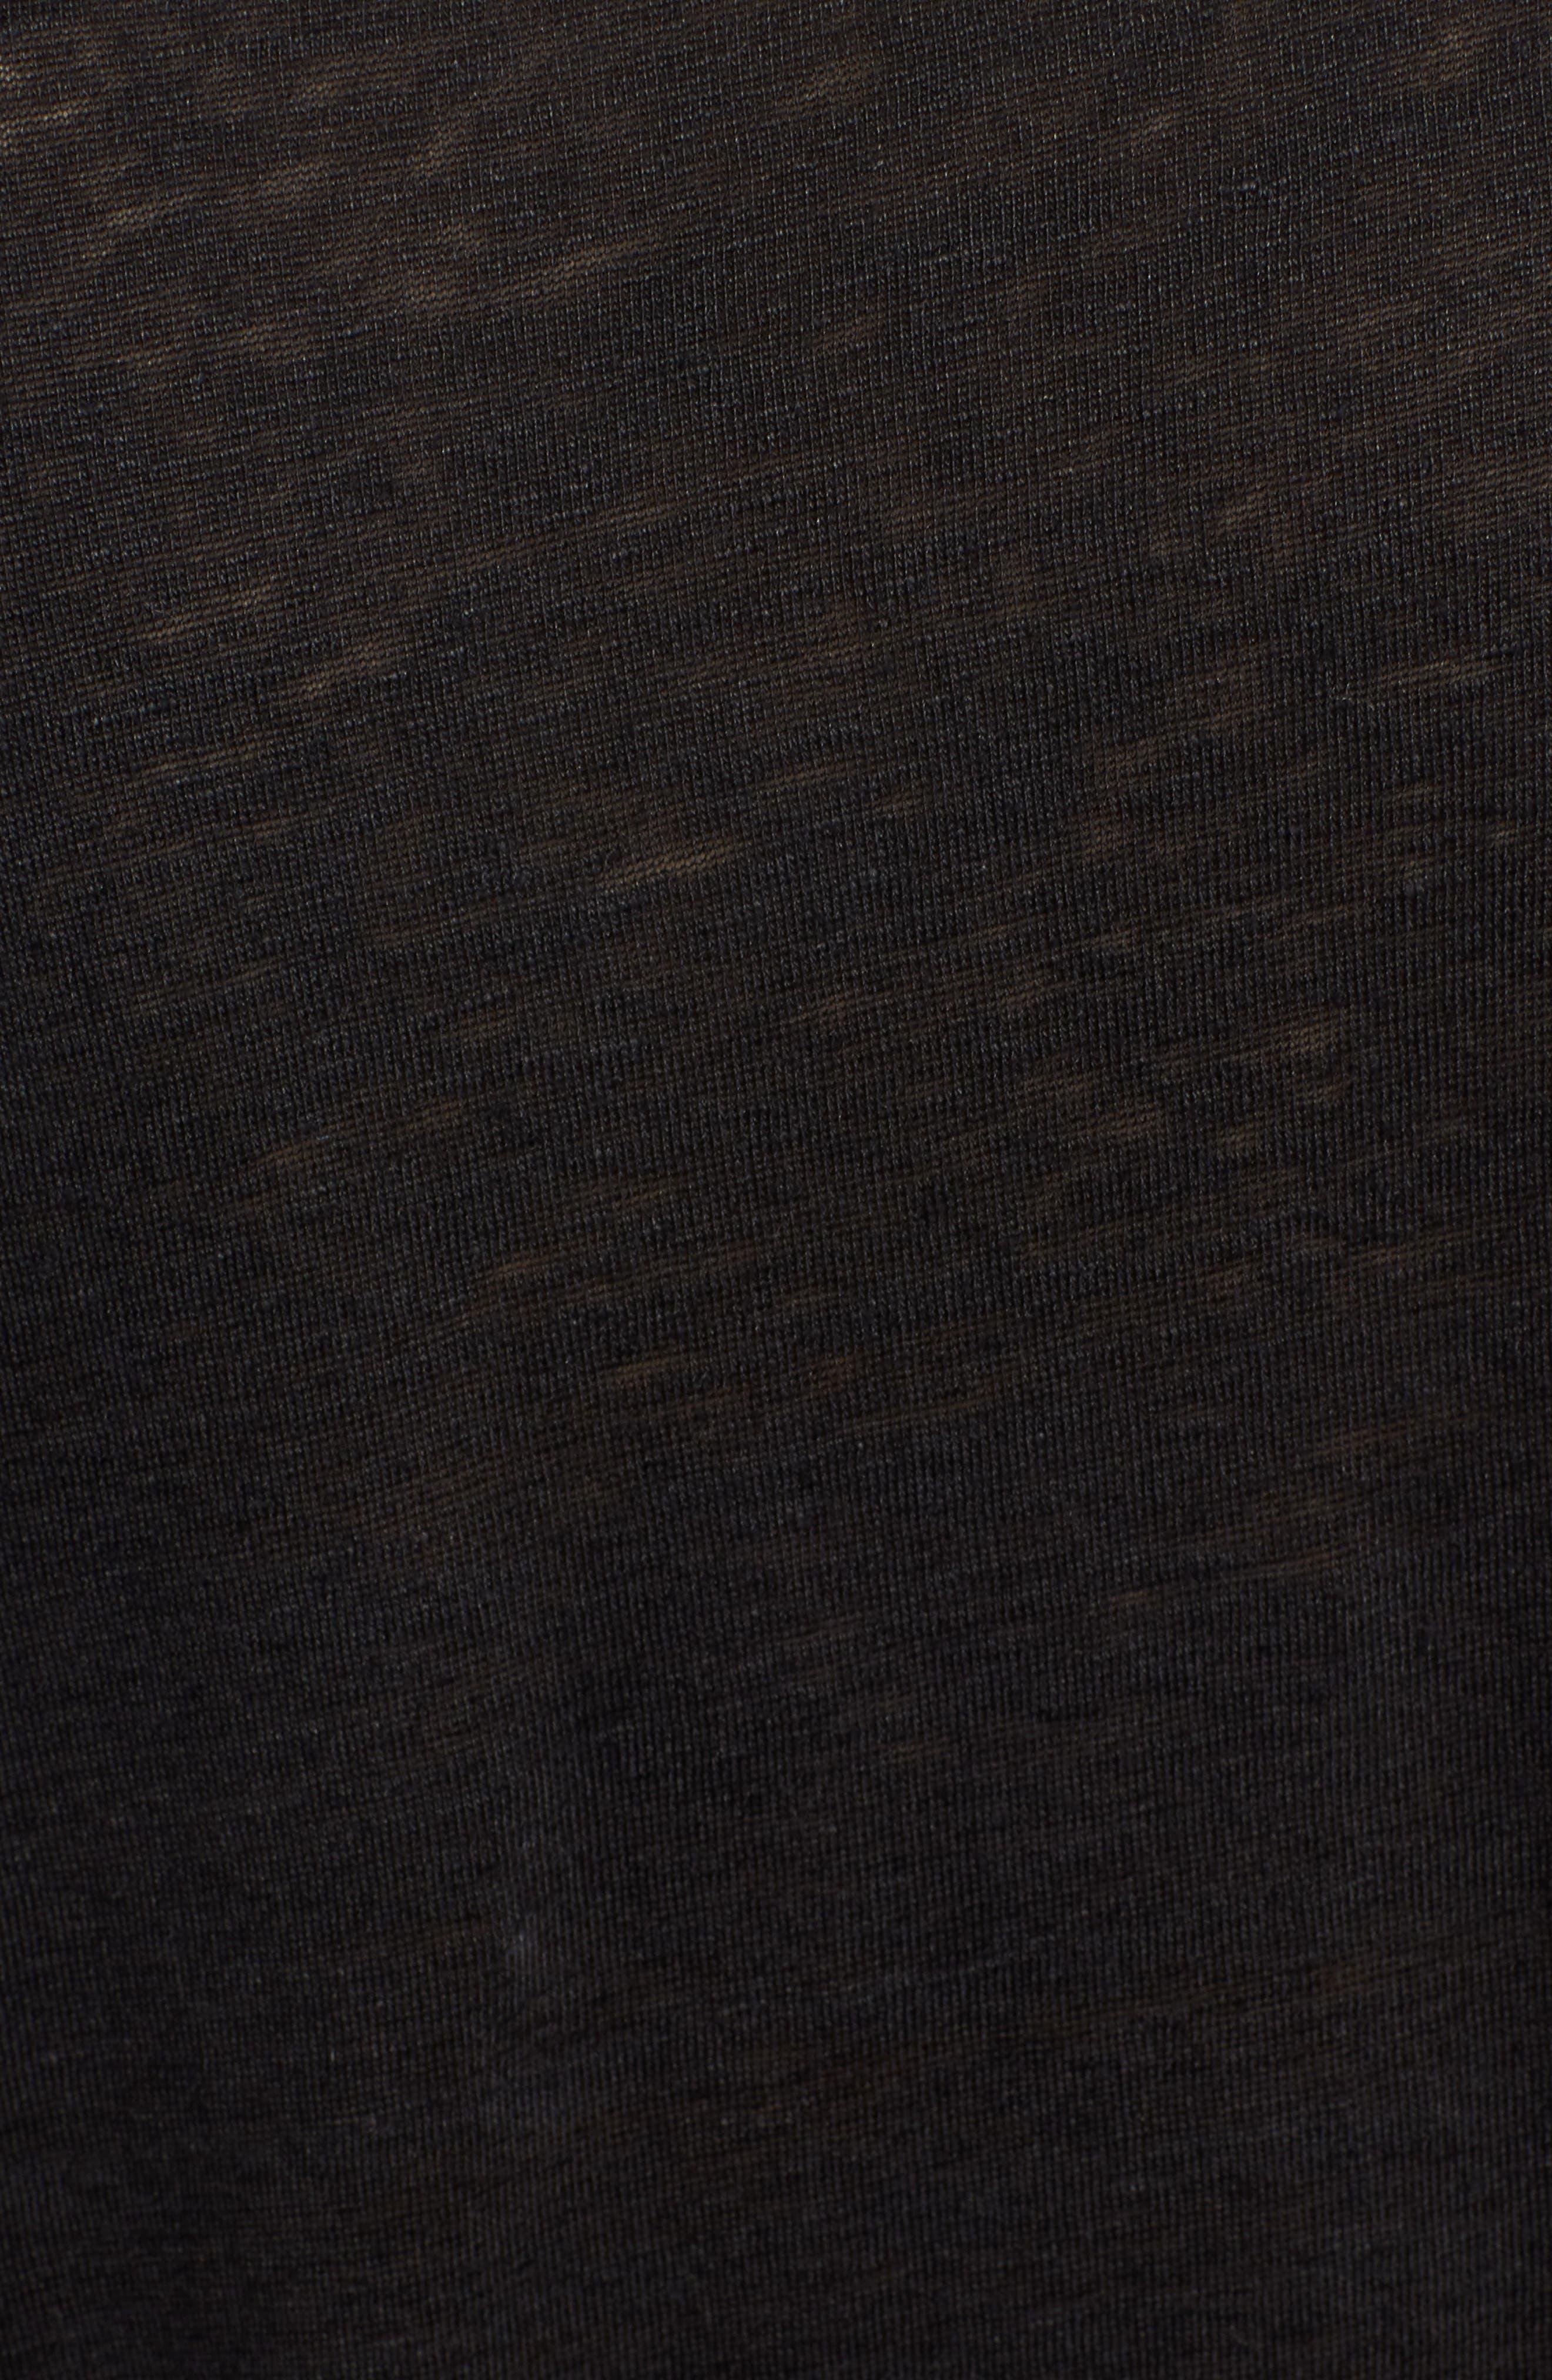 ZADIG & VOLTAIRE,                             Meryl Lin Love Linen Tee,                             Alternate thumbnail 5, color,                             001